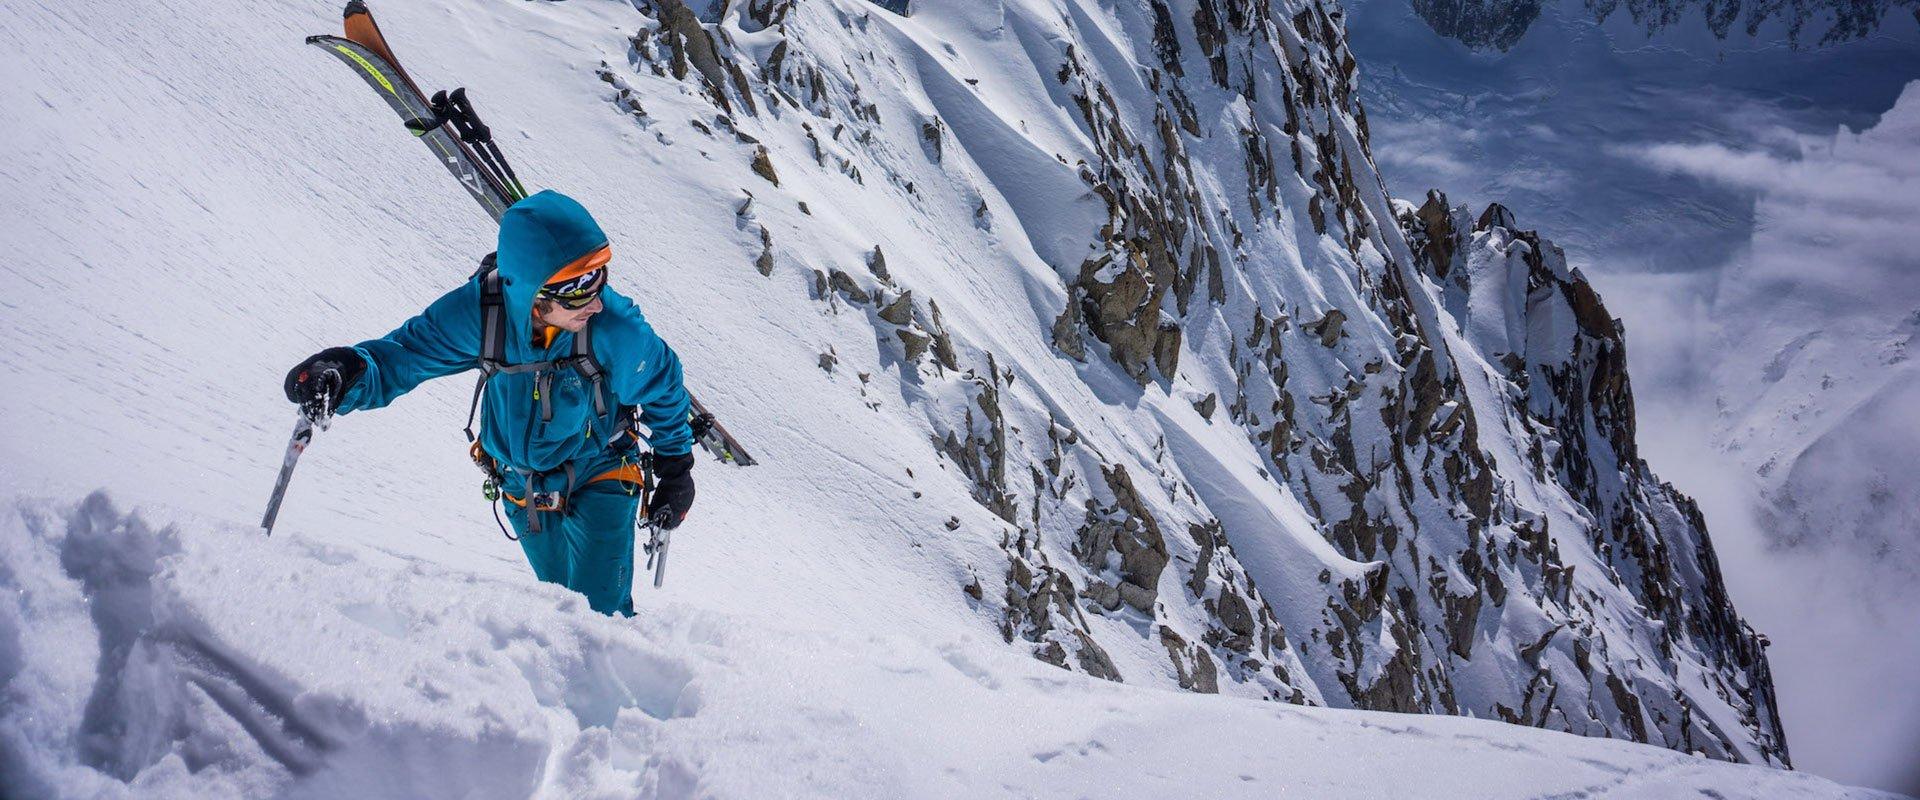 vimff best of ski title bg